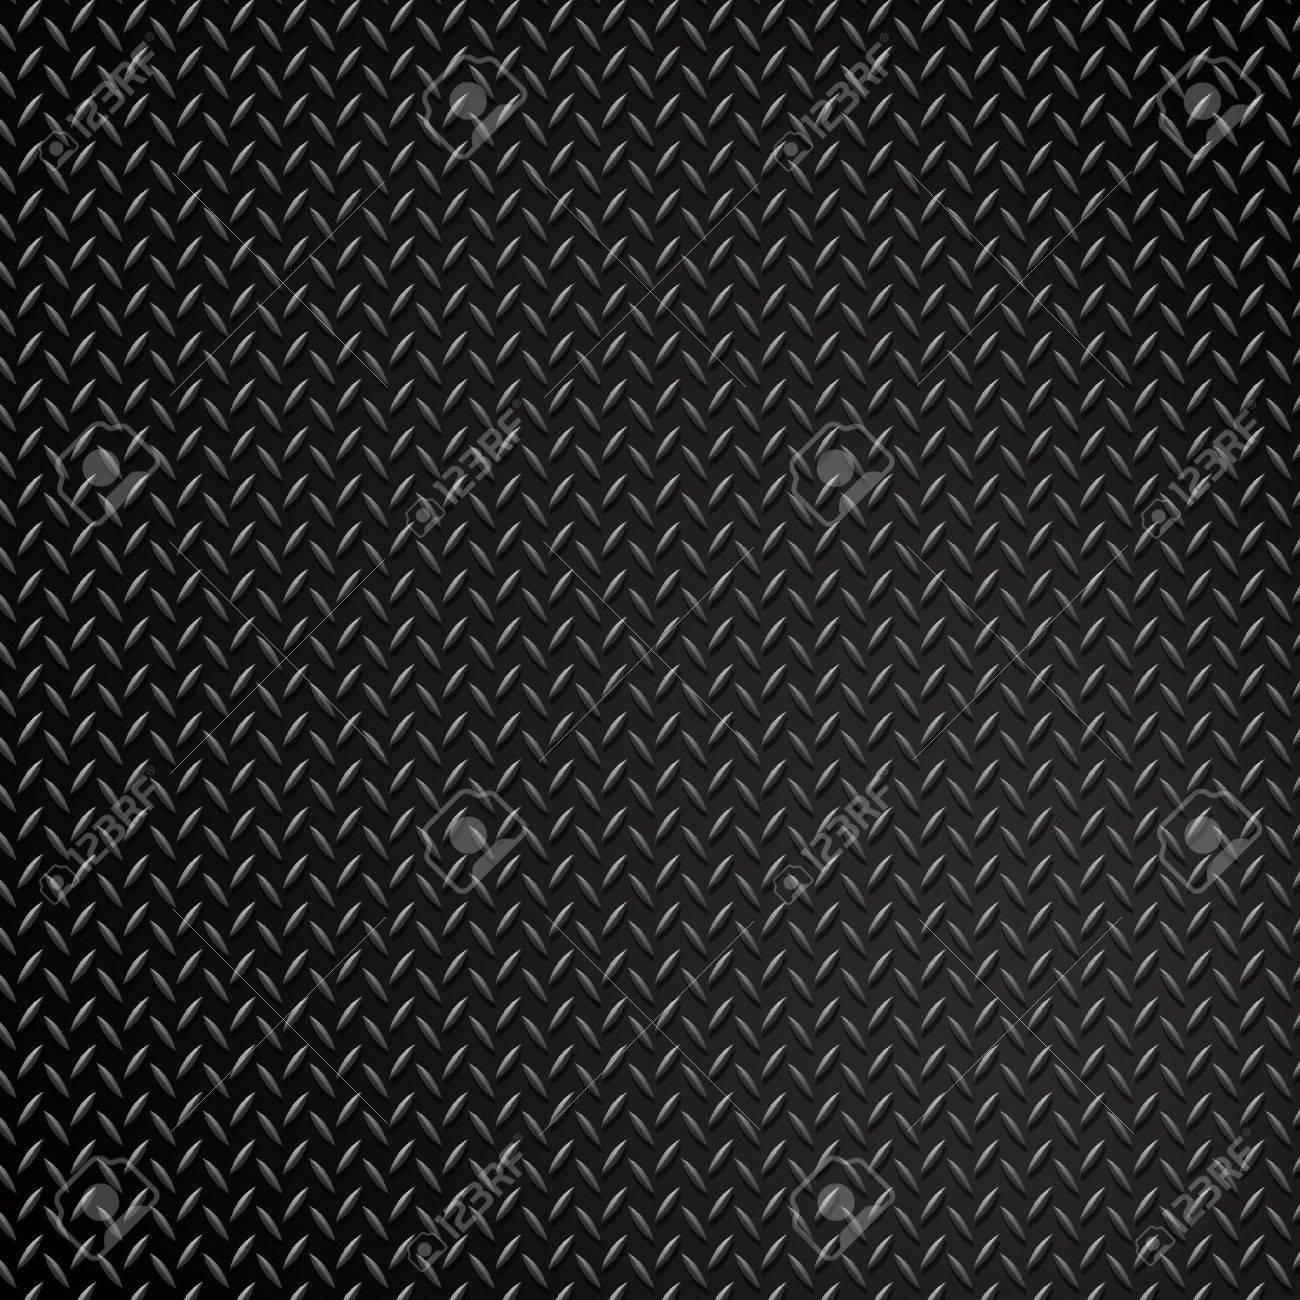 grunge diamond metal background Stock Photo - 7419568